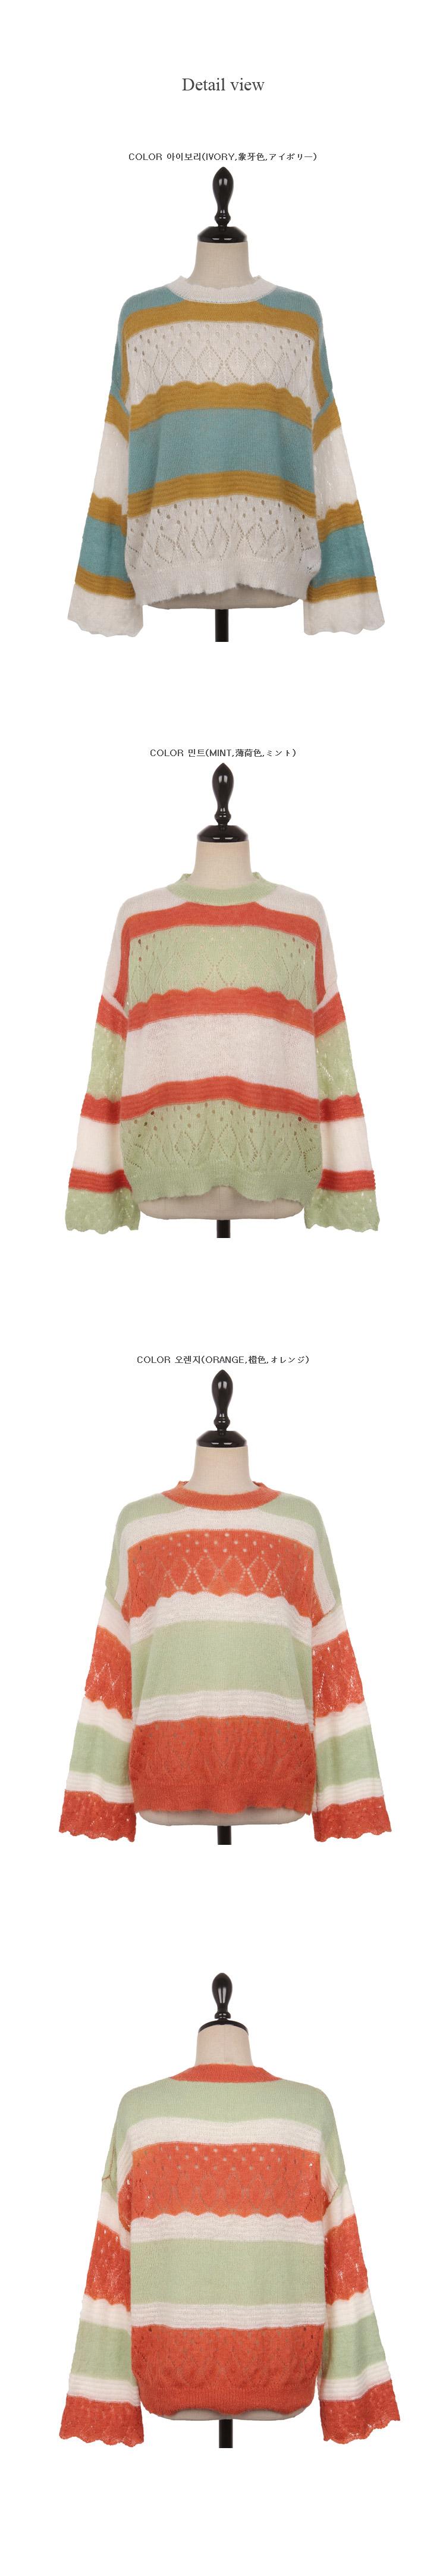 Ellie color knit